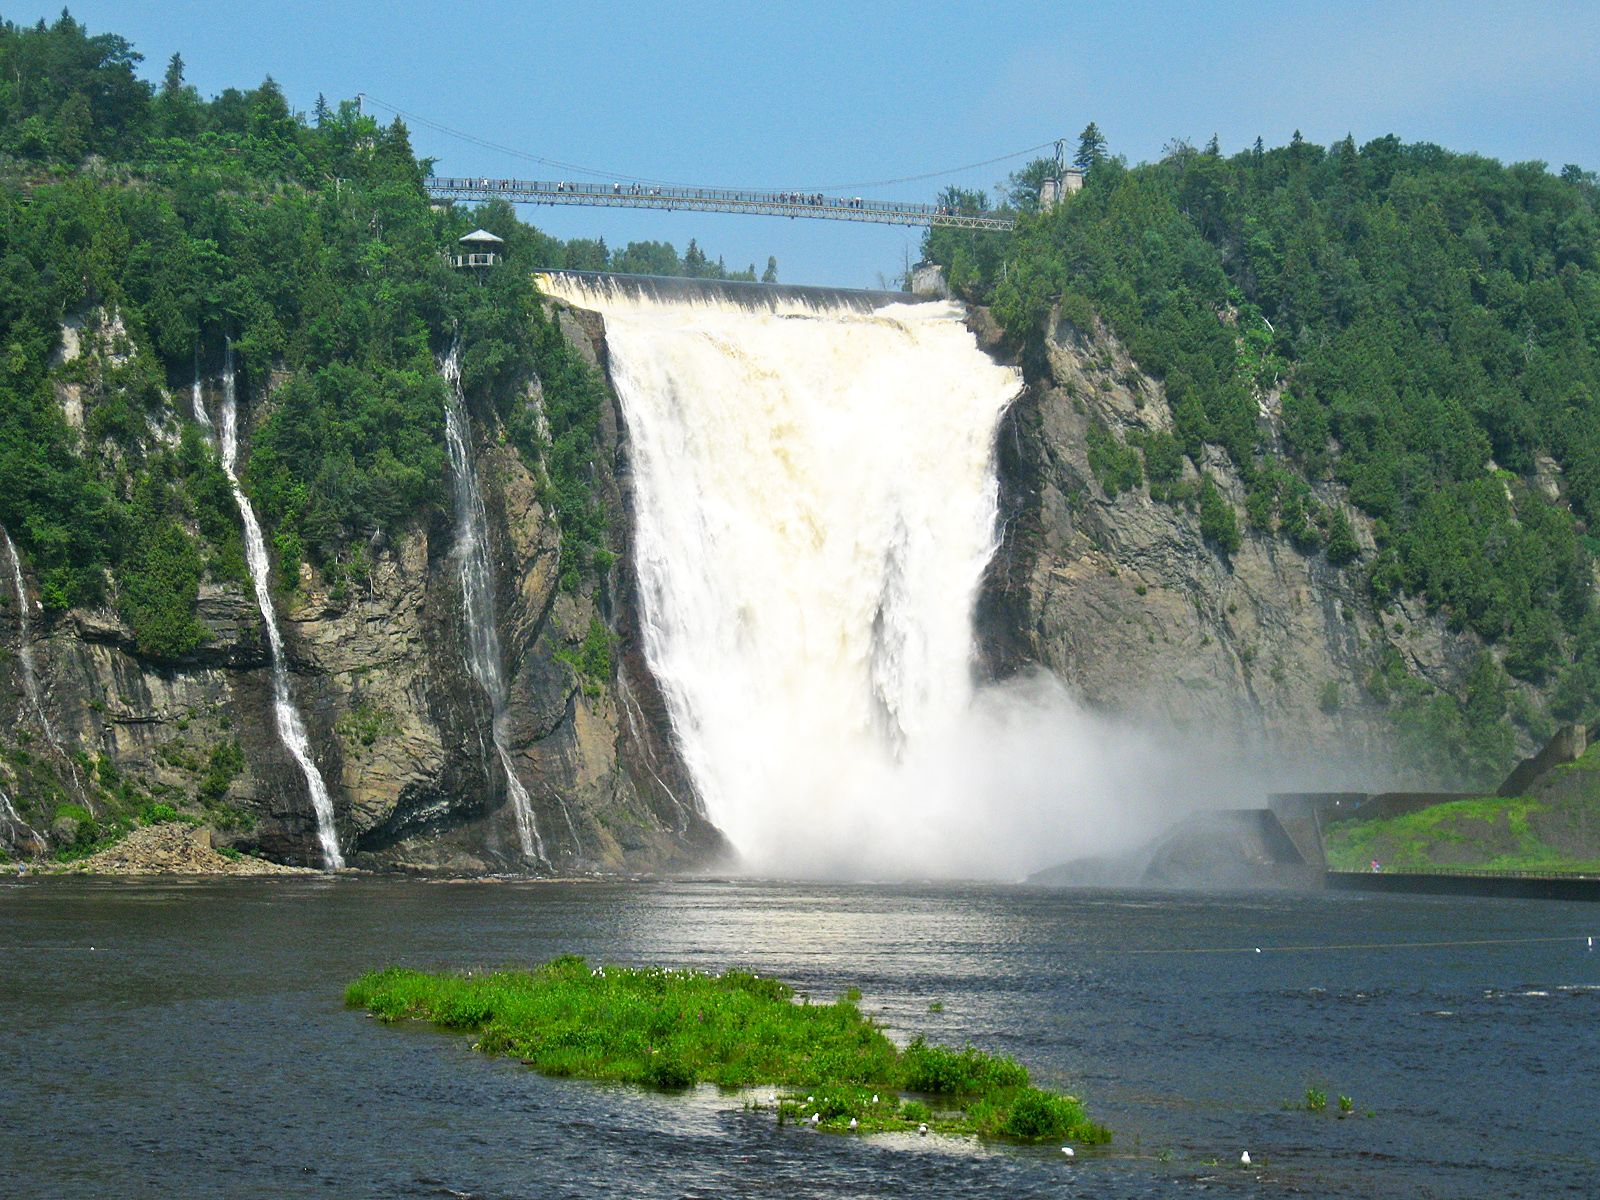 Водопад монморанси расположенный